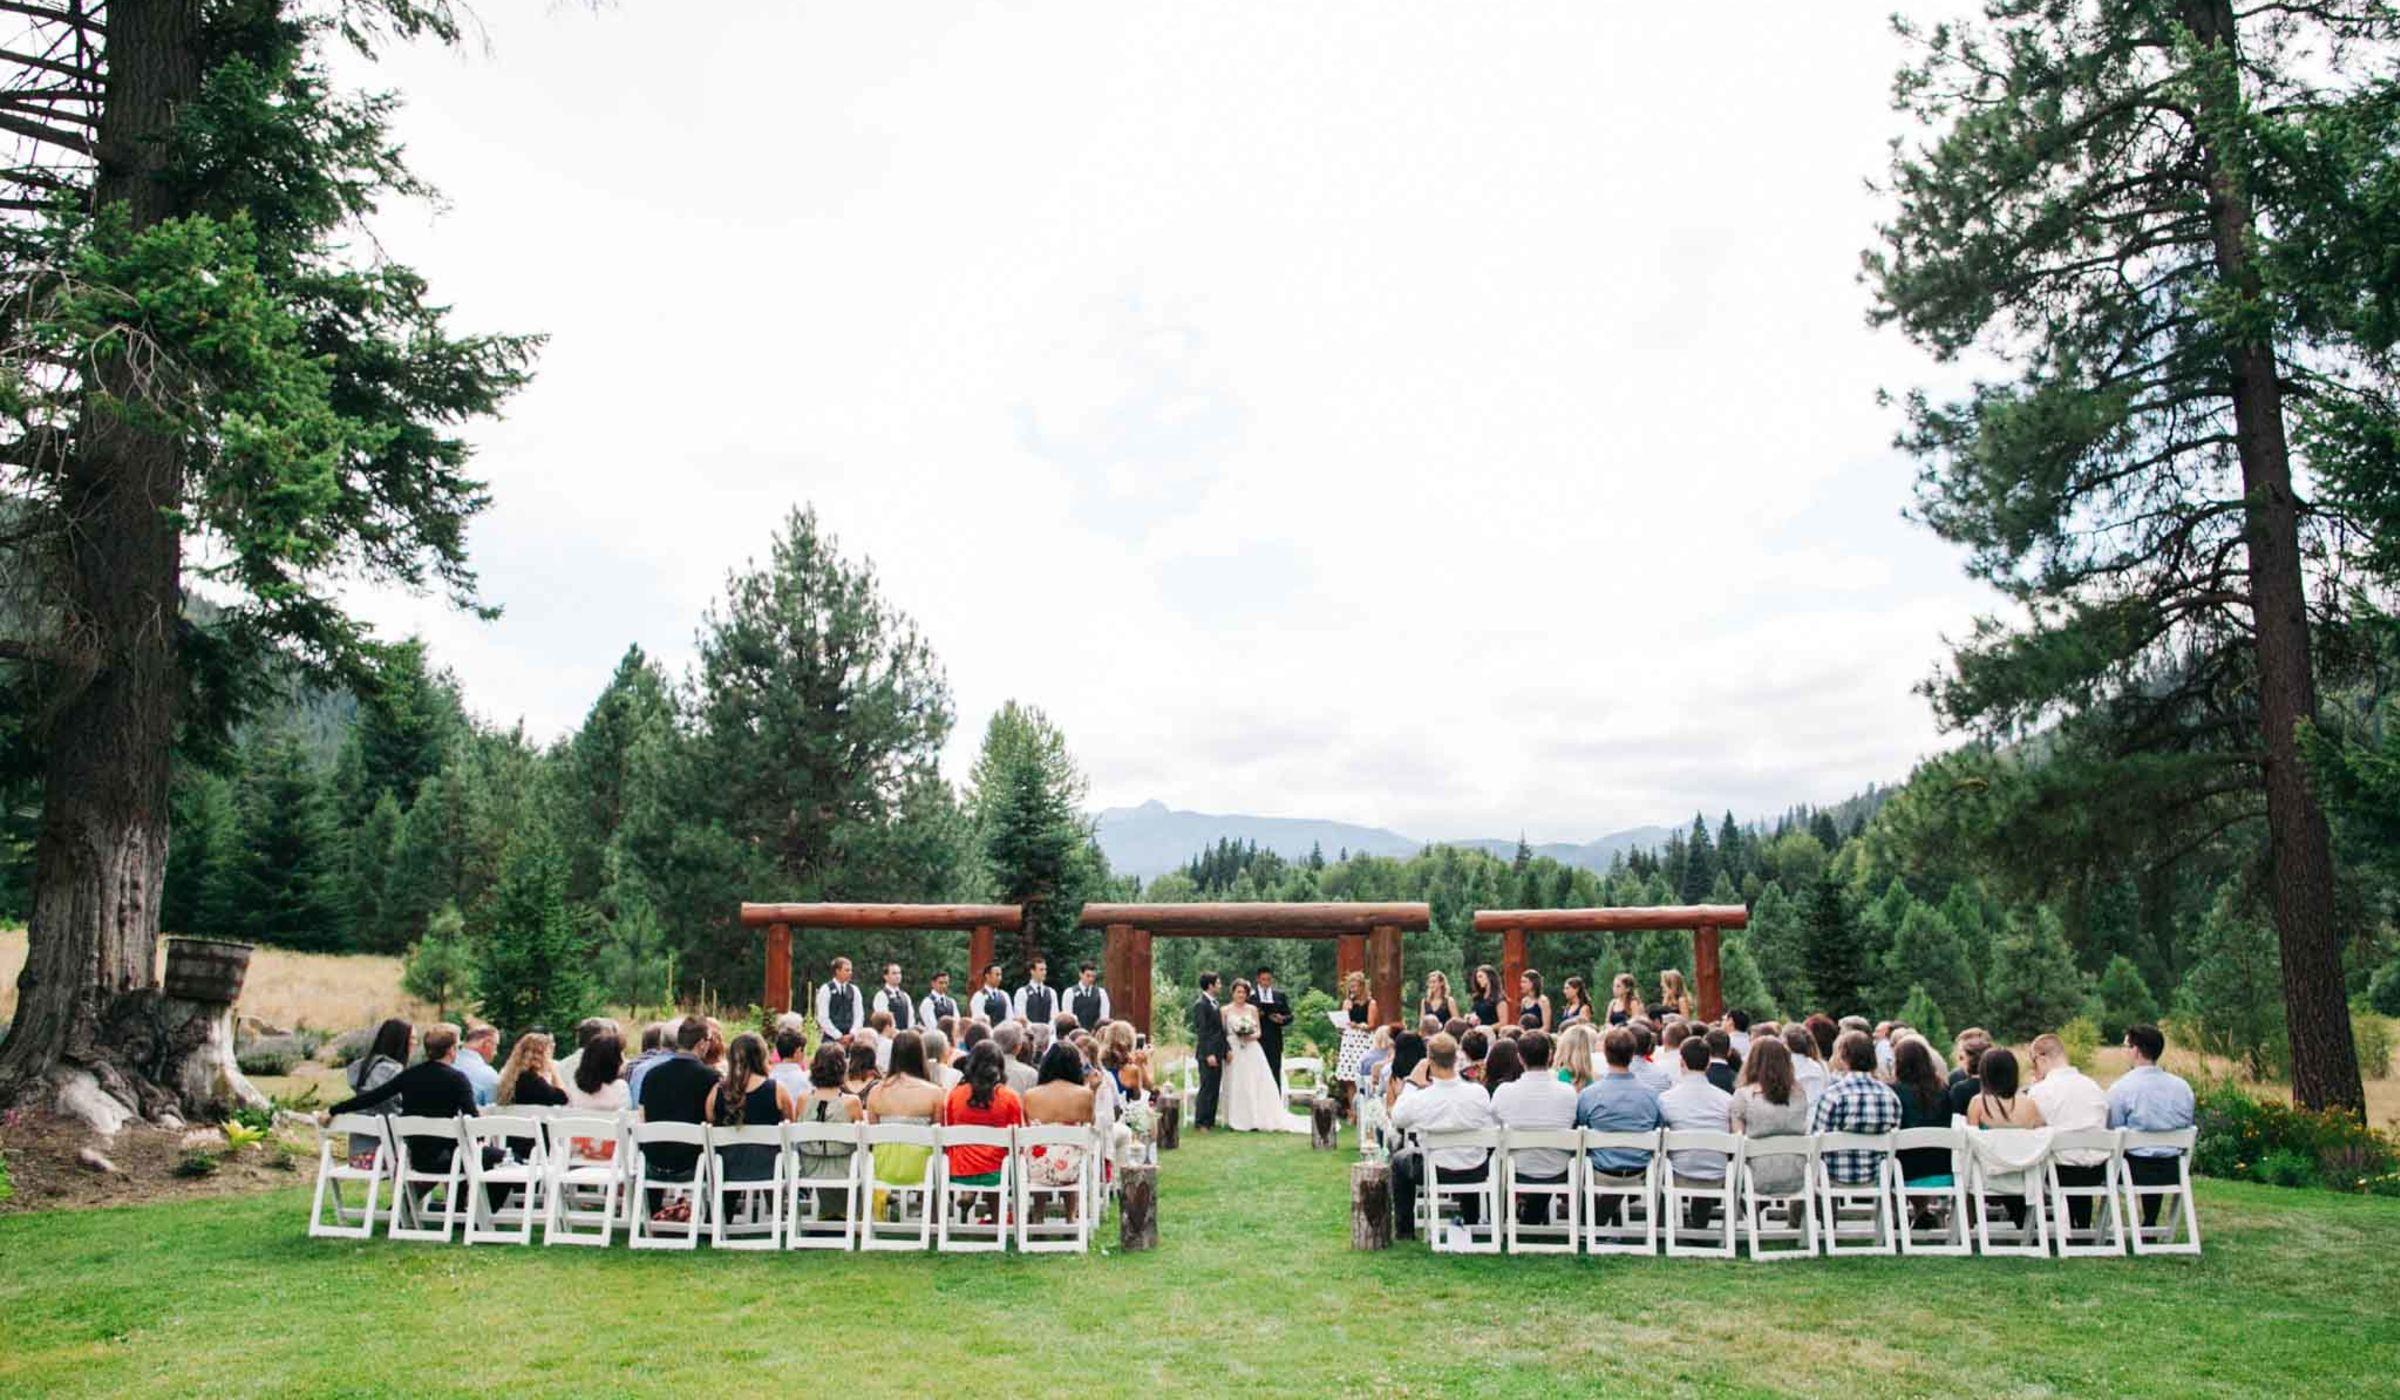 10 Rustic Outdoor Wedding Venues In Seattle - WeddingWire